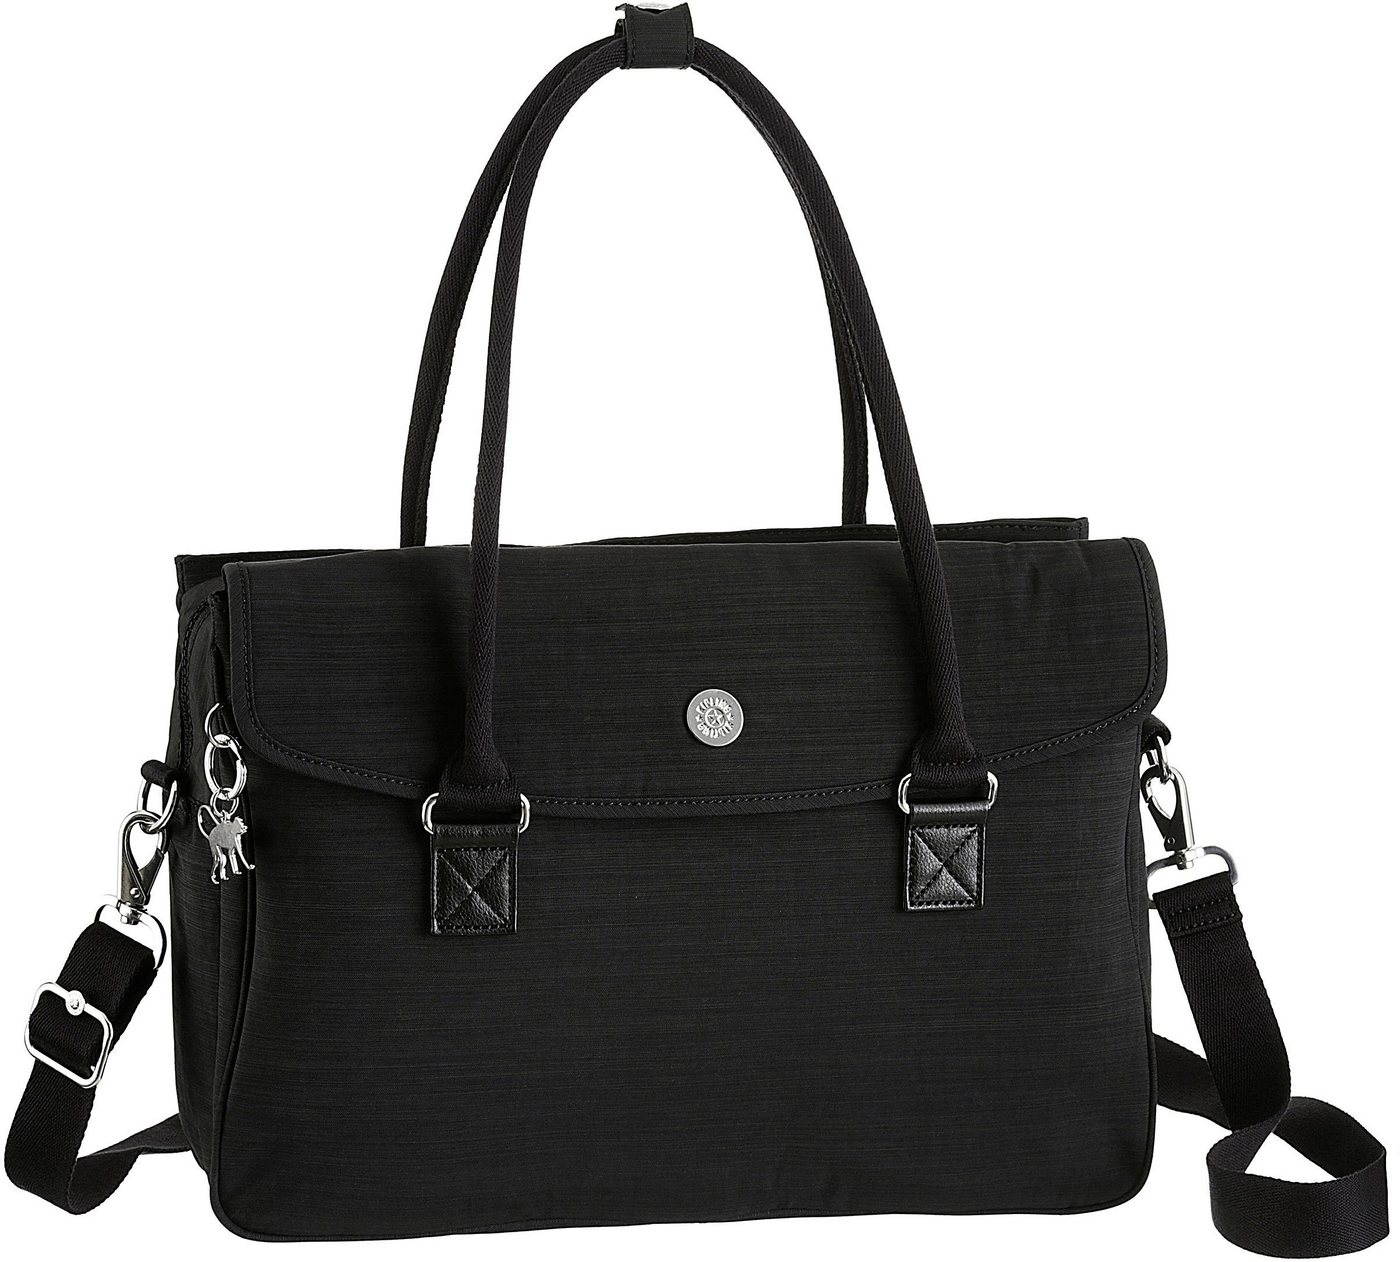 KIPLING Businesstasche »SUPERWORK S«, mit 13-Zoll Laptopfach   Taschen > Businesstaschen > Aktentaschen   Schwarz   KIPLING